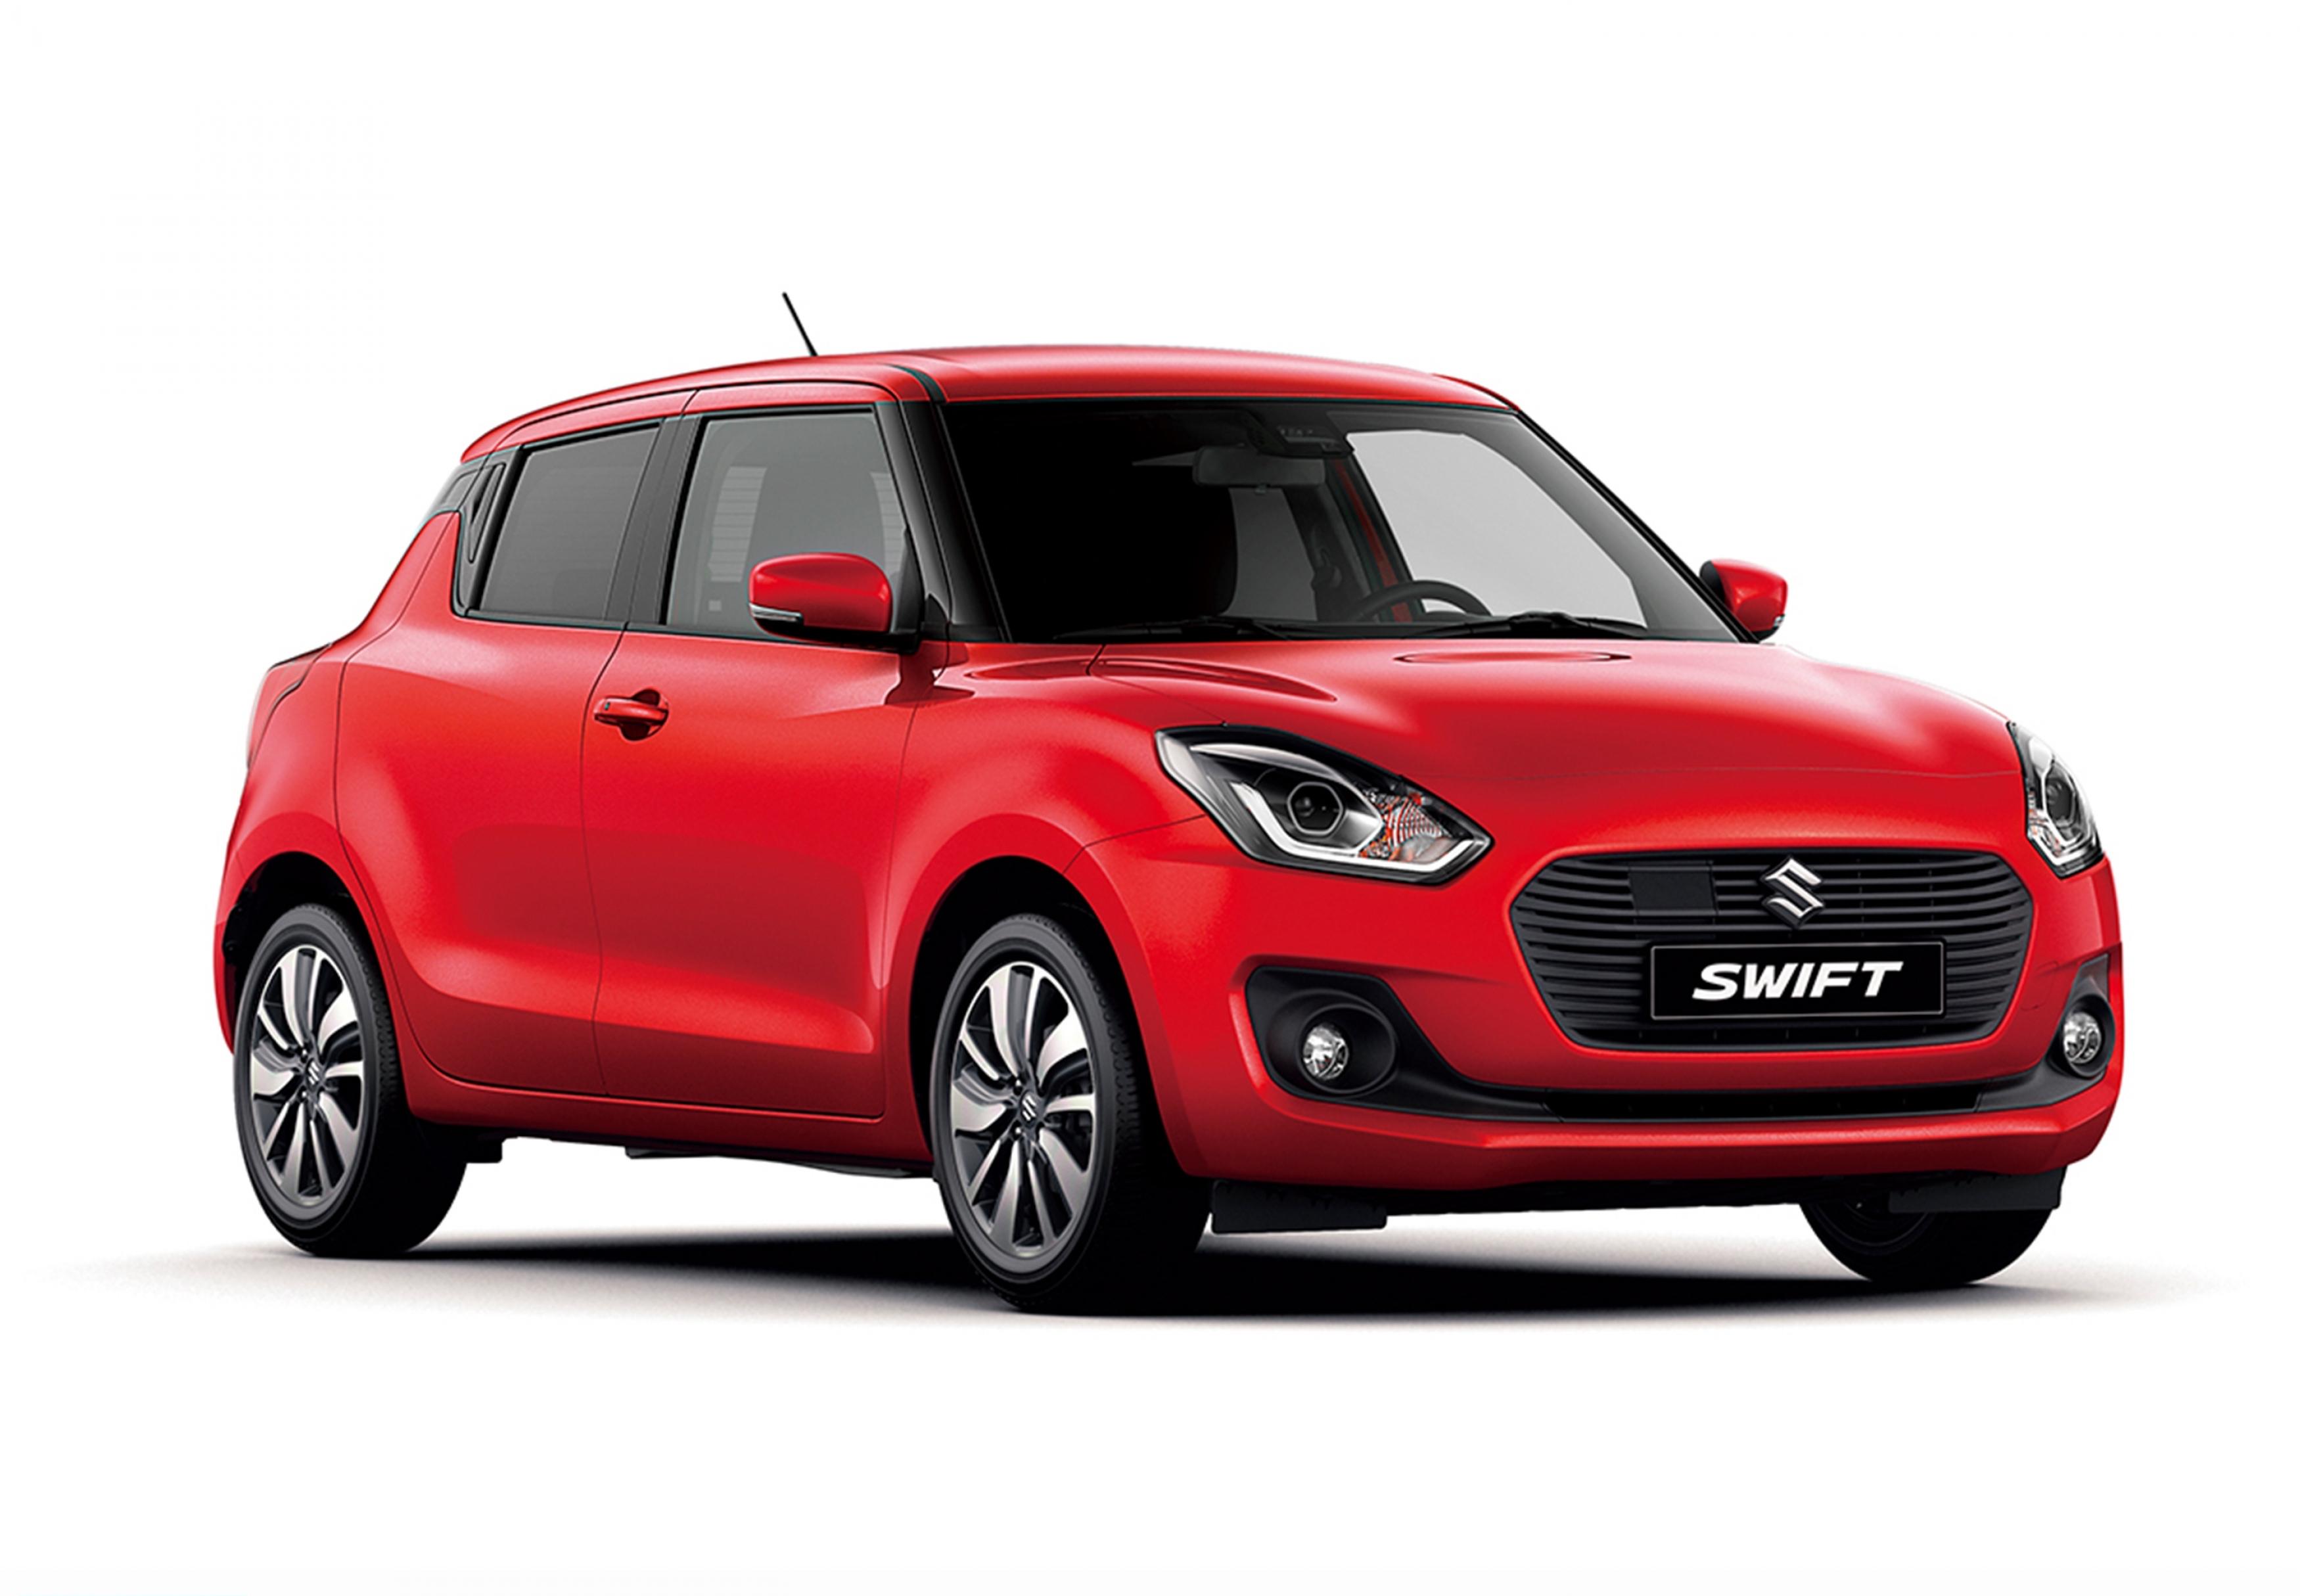 the new third generation suzuki swift   unveiled at the